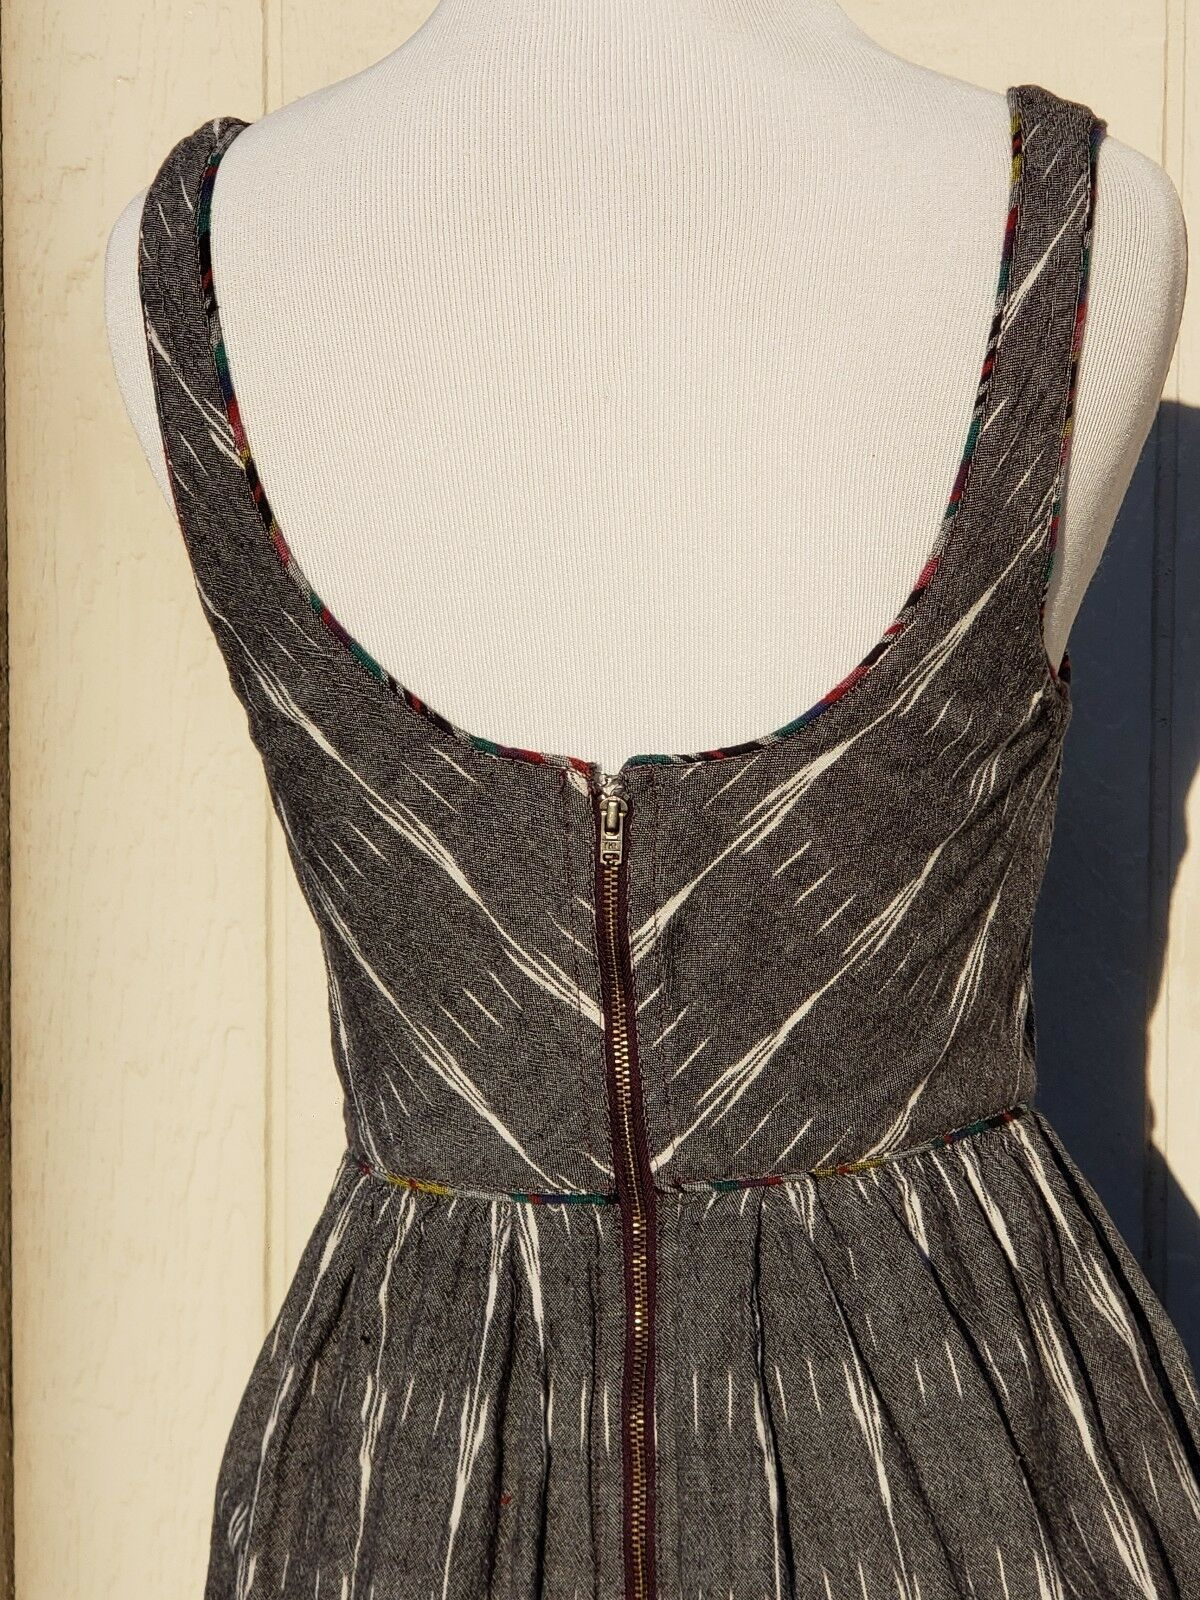 Free People Sz 4 S Sleeveless Dress Layered Embroidered Cotton Gray Tribal Ikat